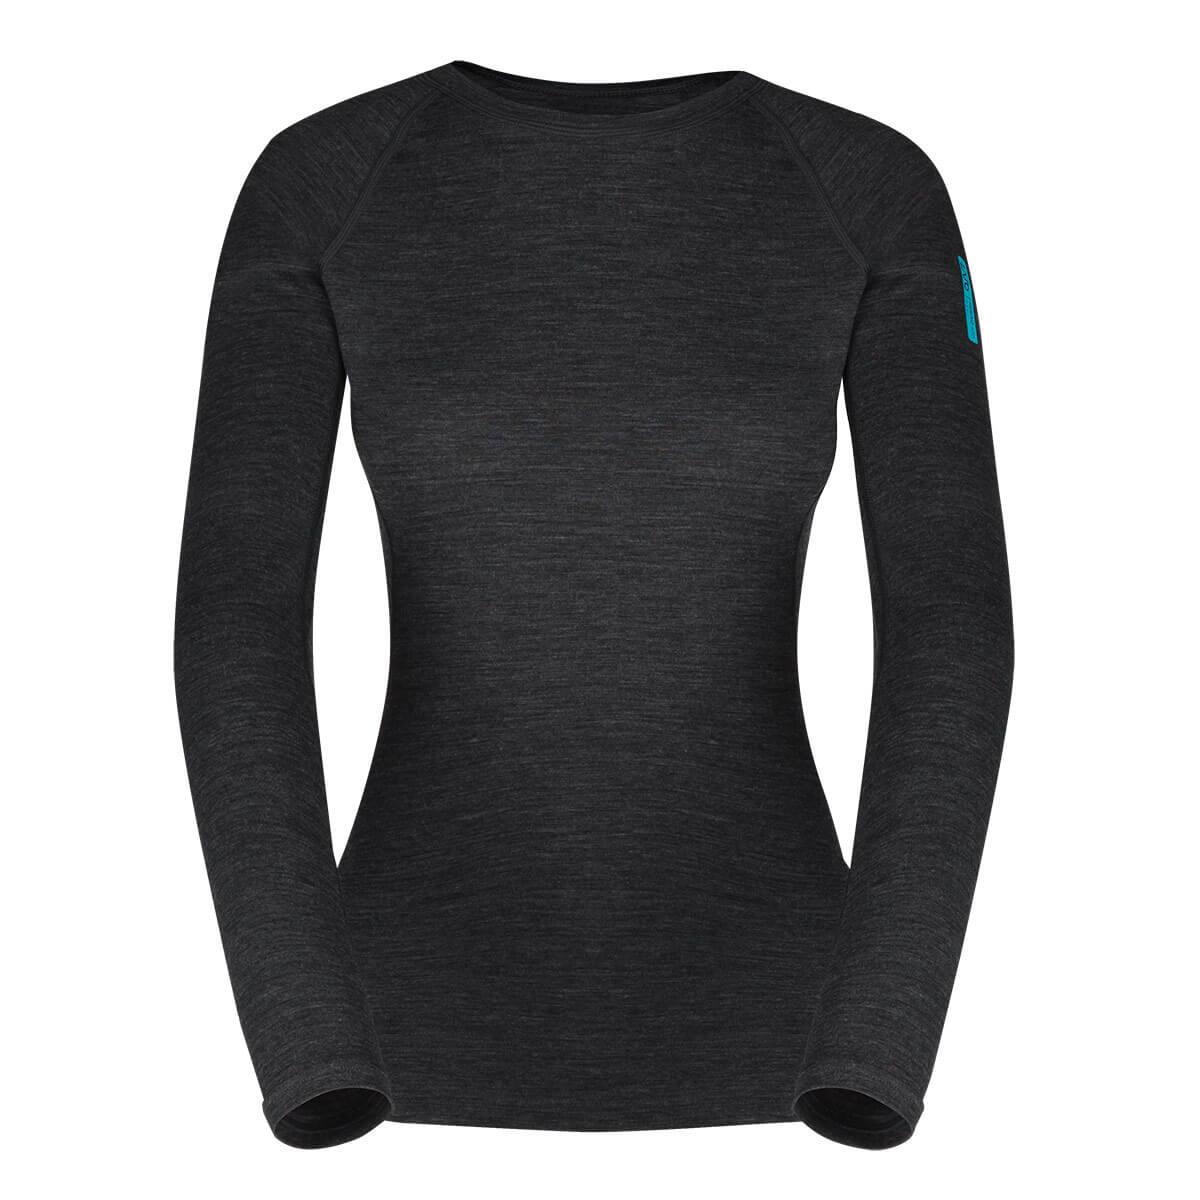 Dámske tričko Zajo Elsa Merino Nylon W T-shirt LS Black - veľkosť XS